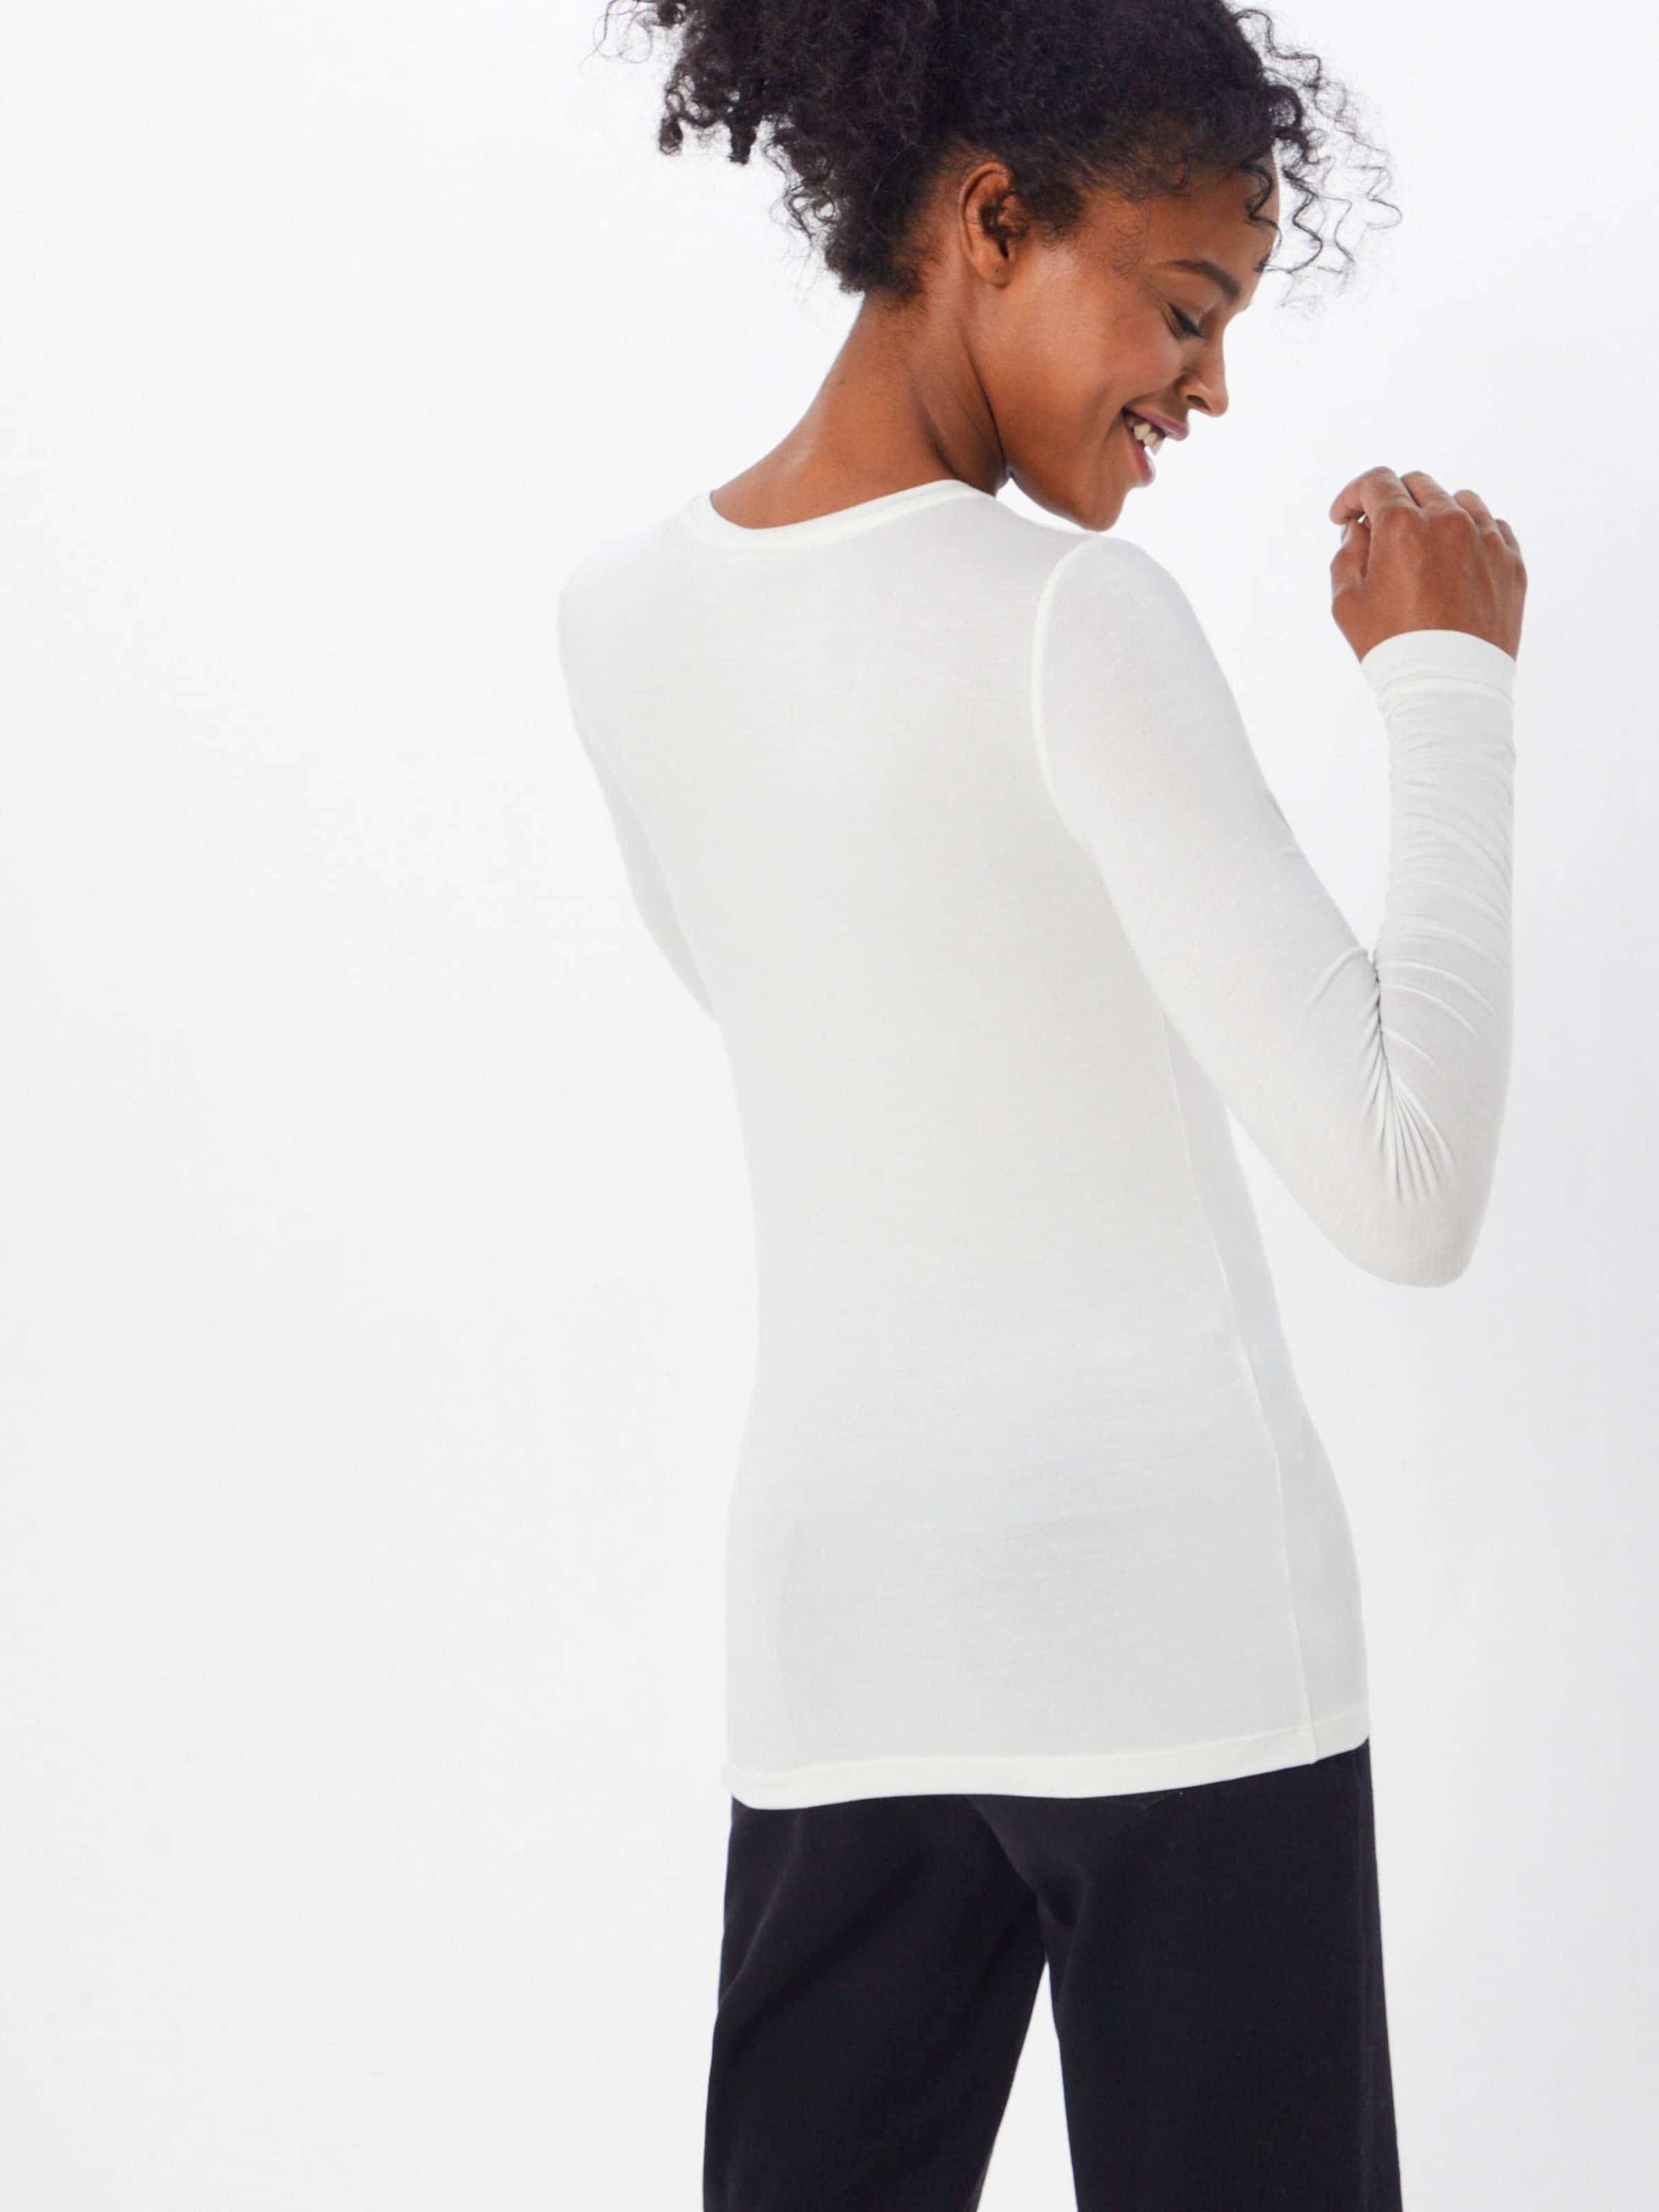 T T shirt shirt Noir En Noir En Vila Vila nwX0OP8k